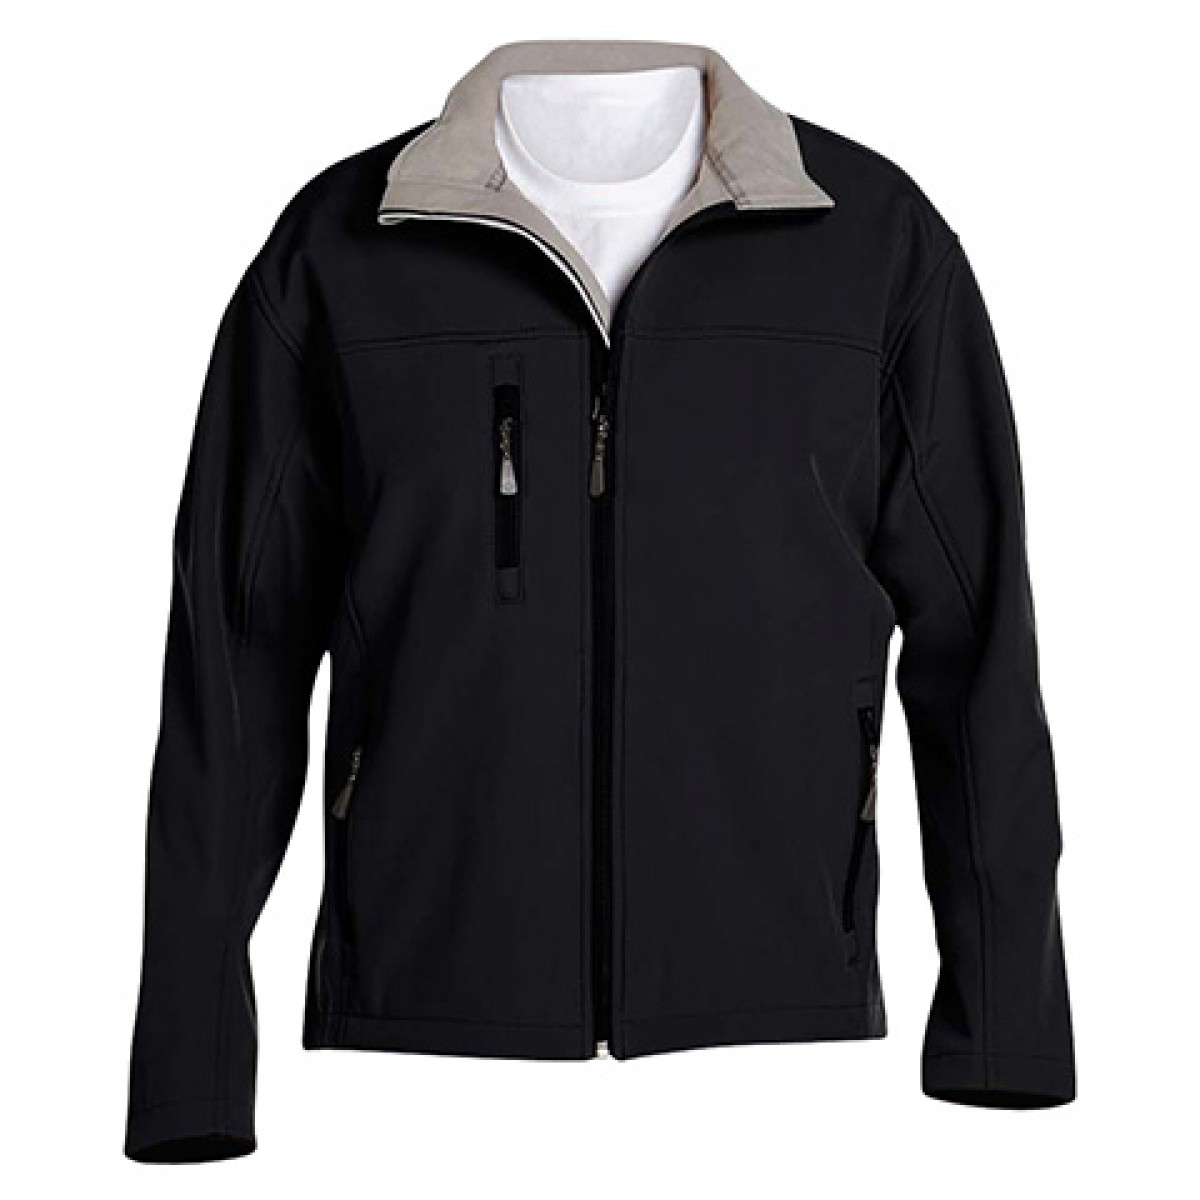 Men's Soft Shell Jacket-Black-4XL